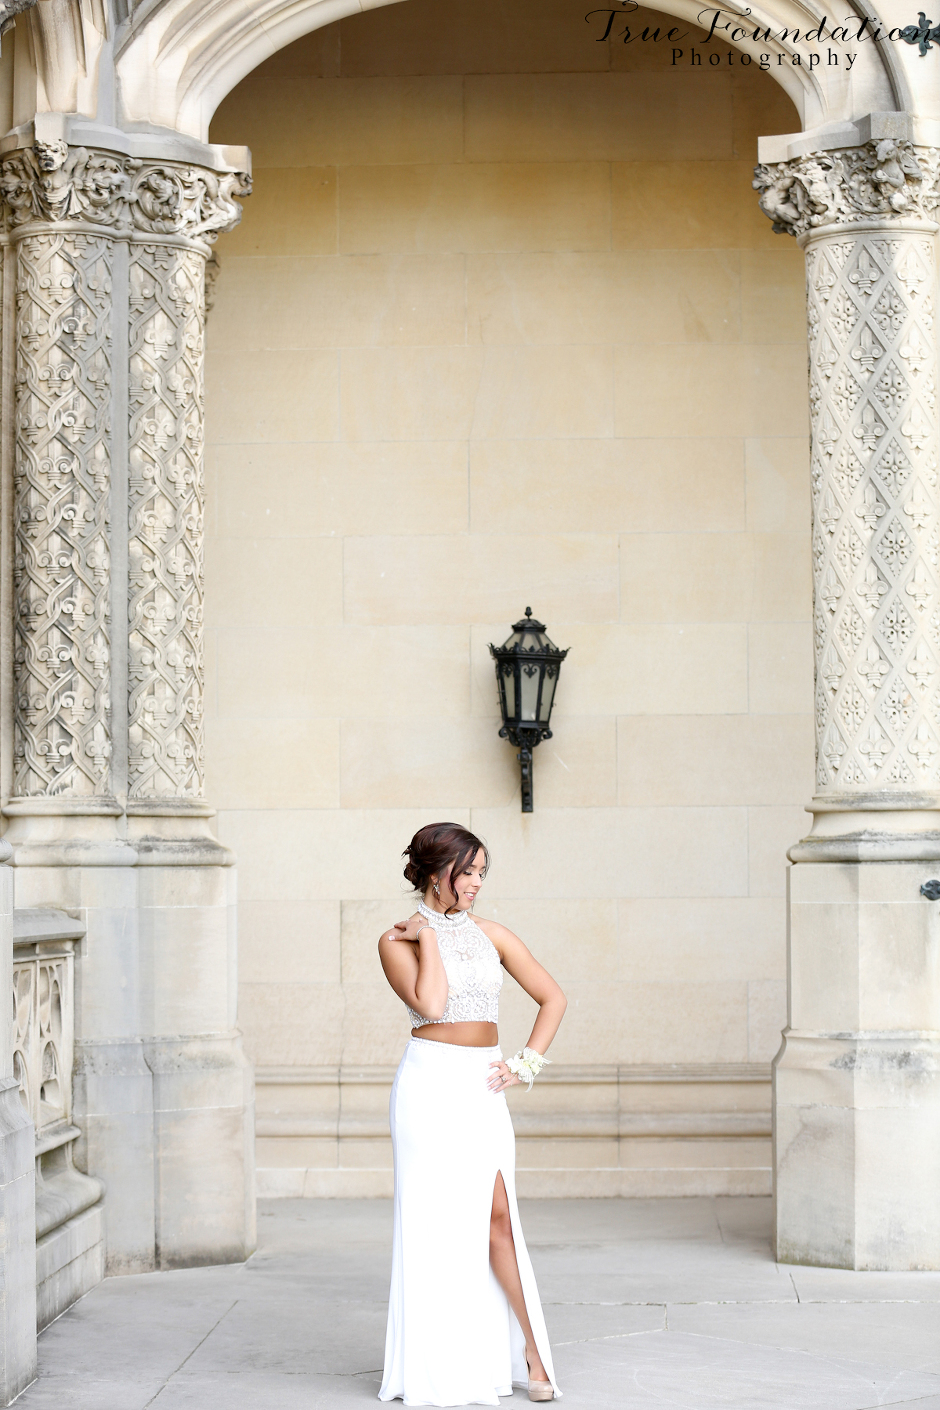 Senior - Prom - Photography - Photos - North - Carolina - NC - Photographer - Biltmore - Hendersonville - Greenville - Charlotte - High - School - Dance (12)